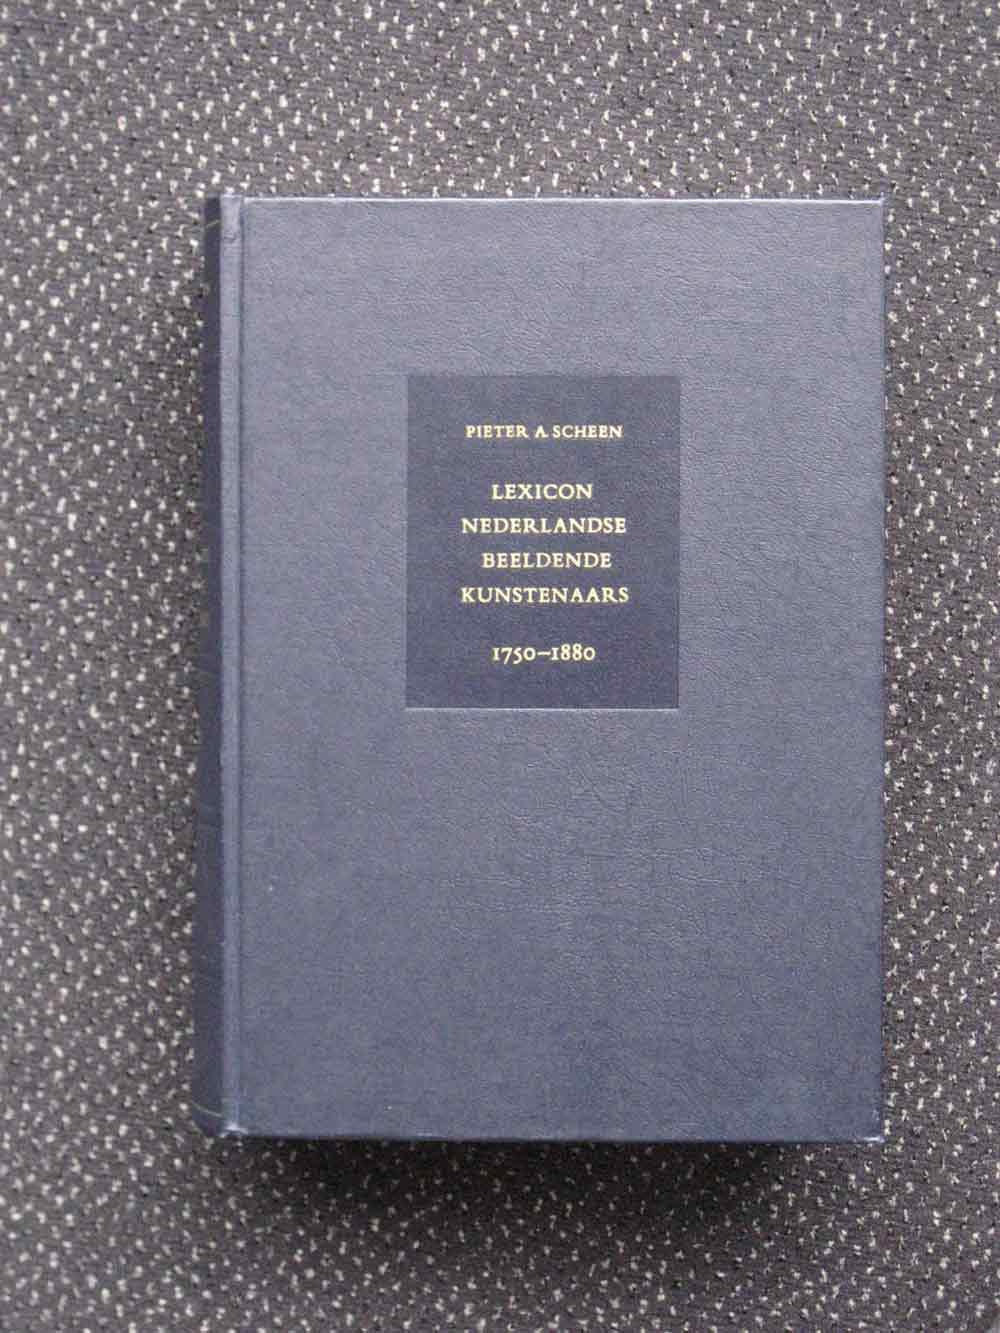 P.A.Scheen Lexicon Dutch painters, 1750-1850, new